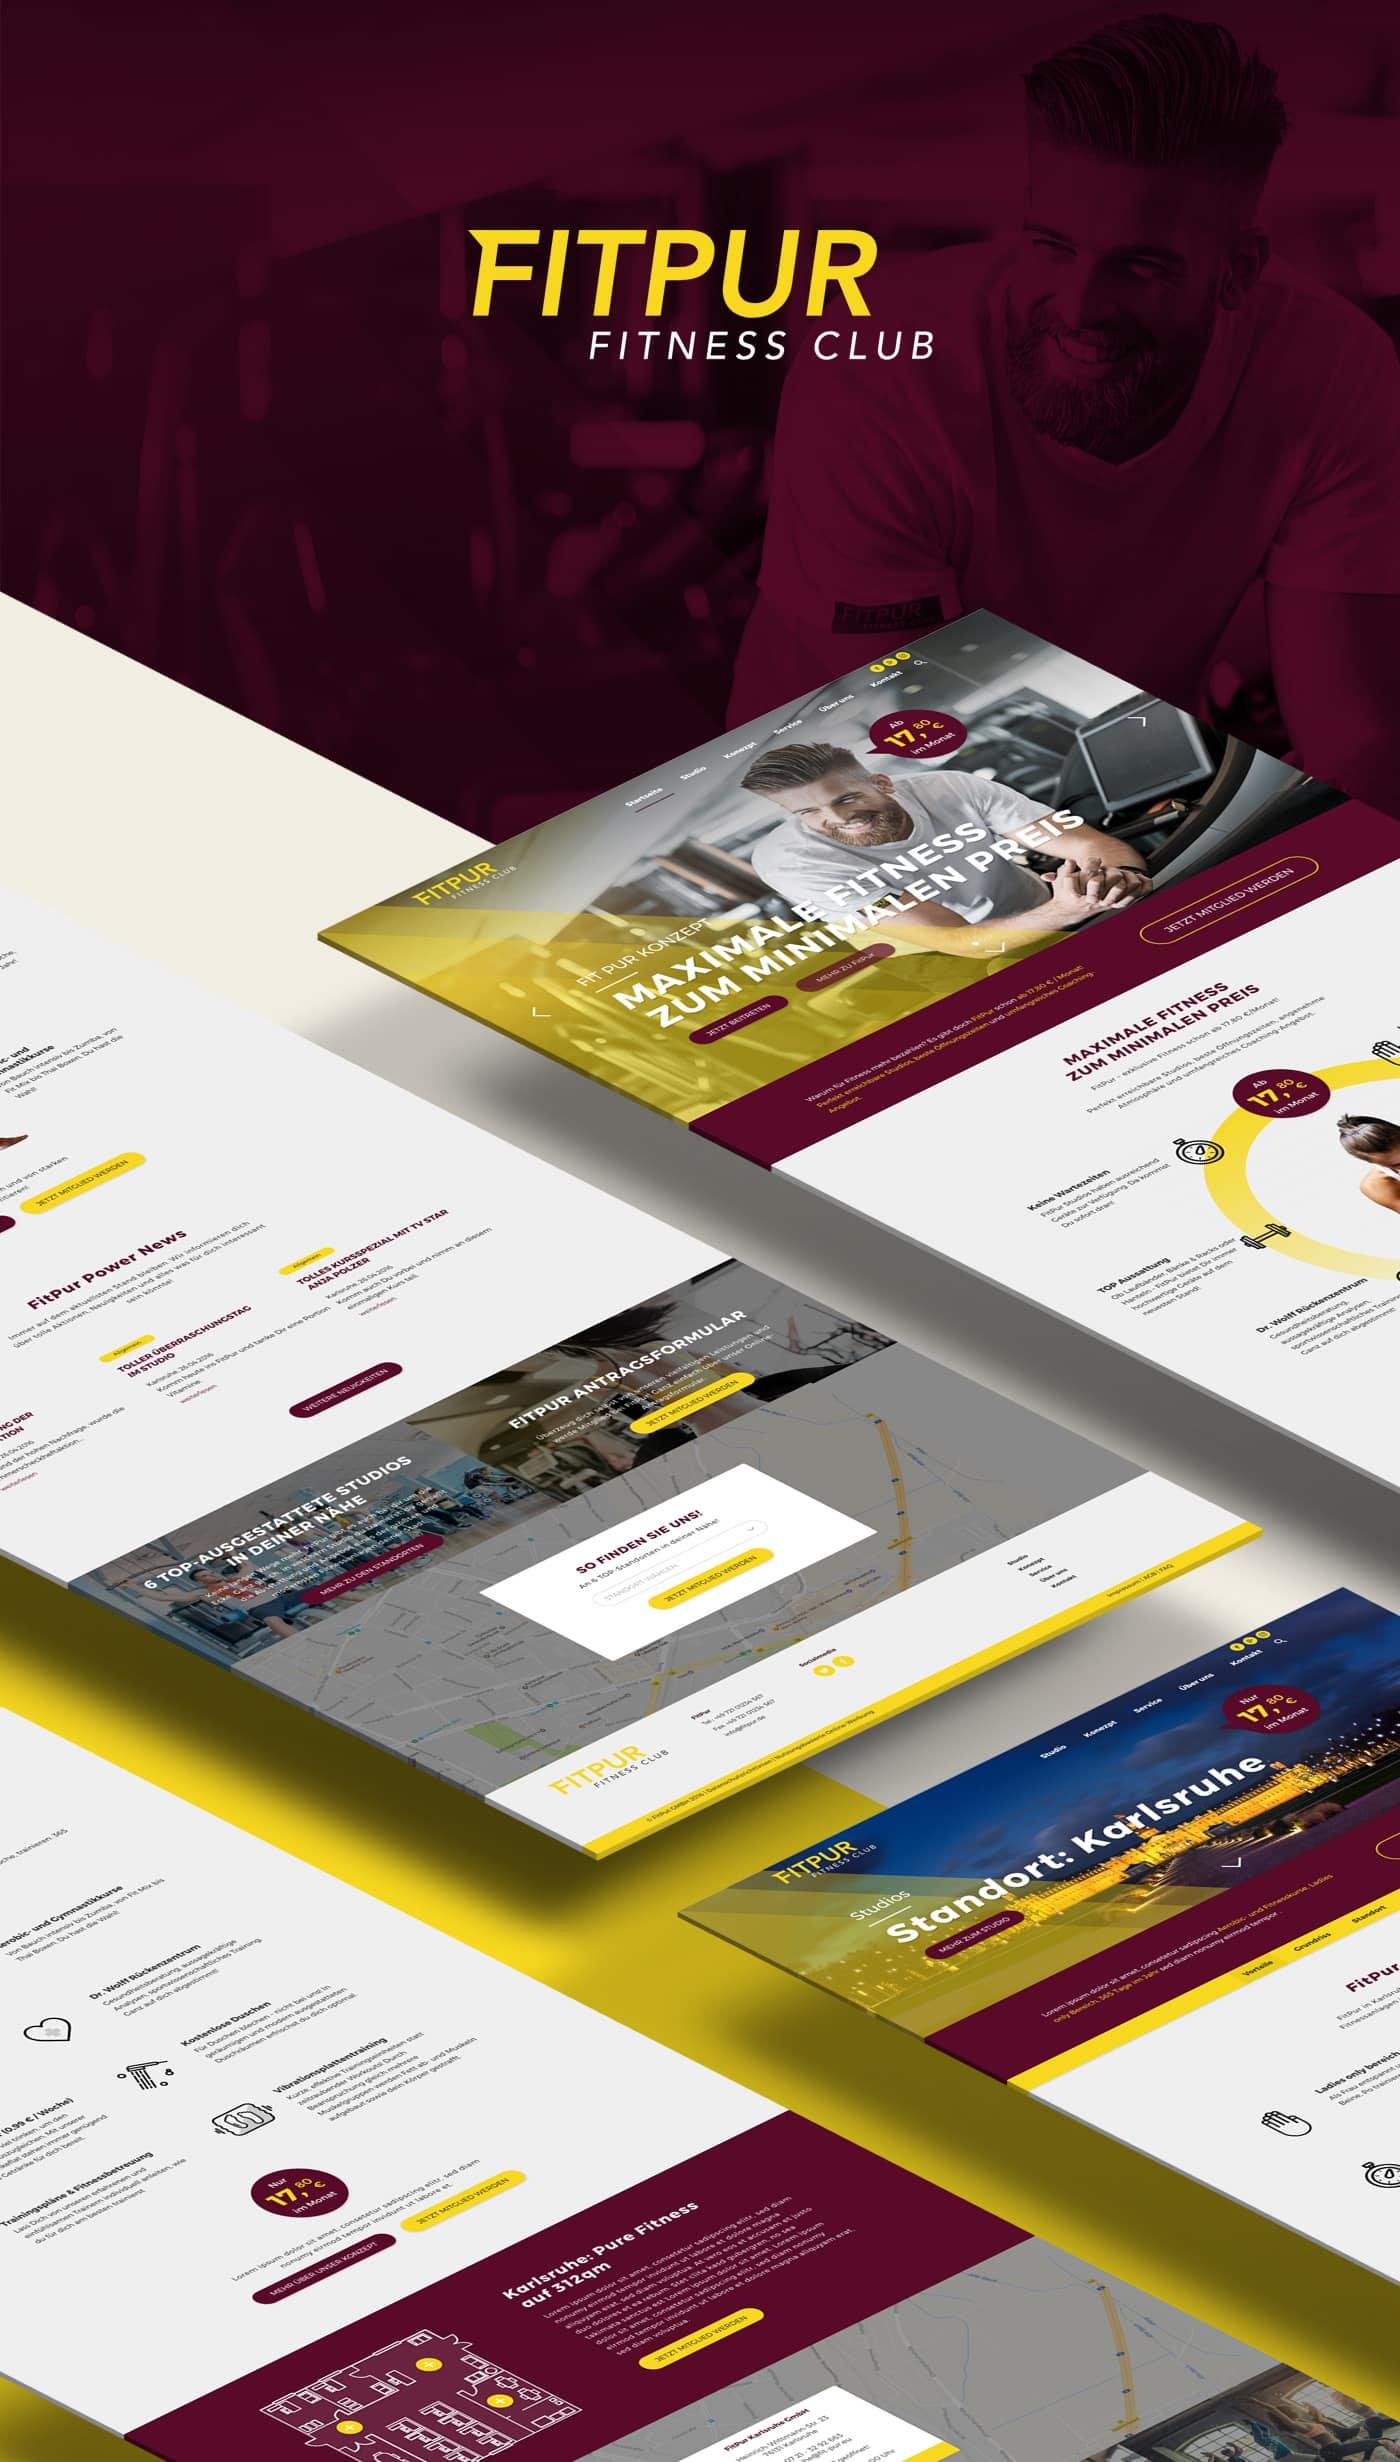 FitPur Studio Unternehmenswebseite